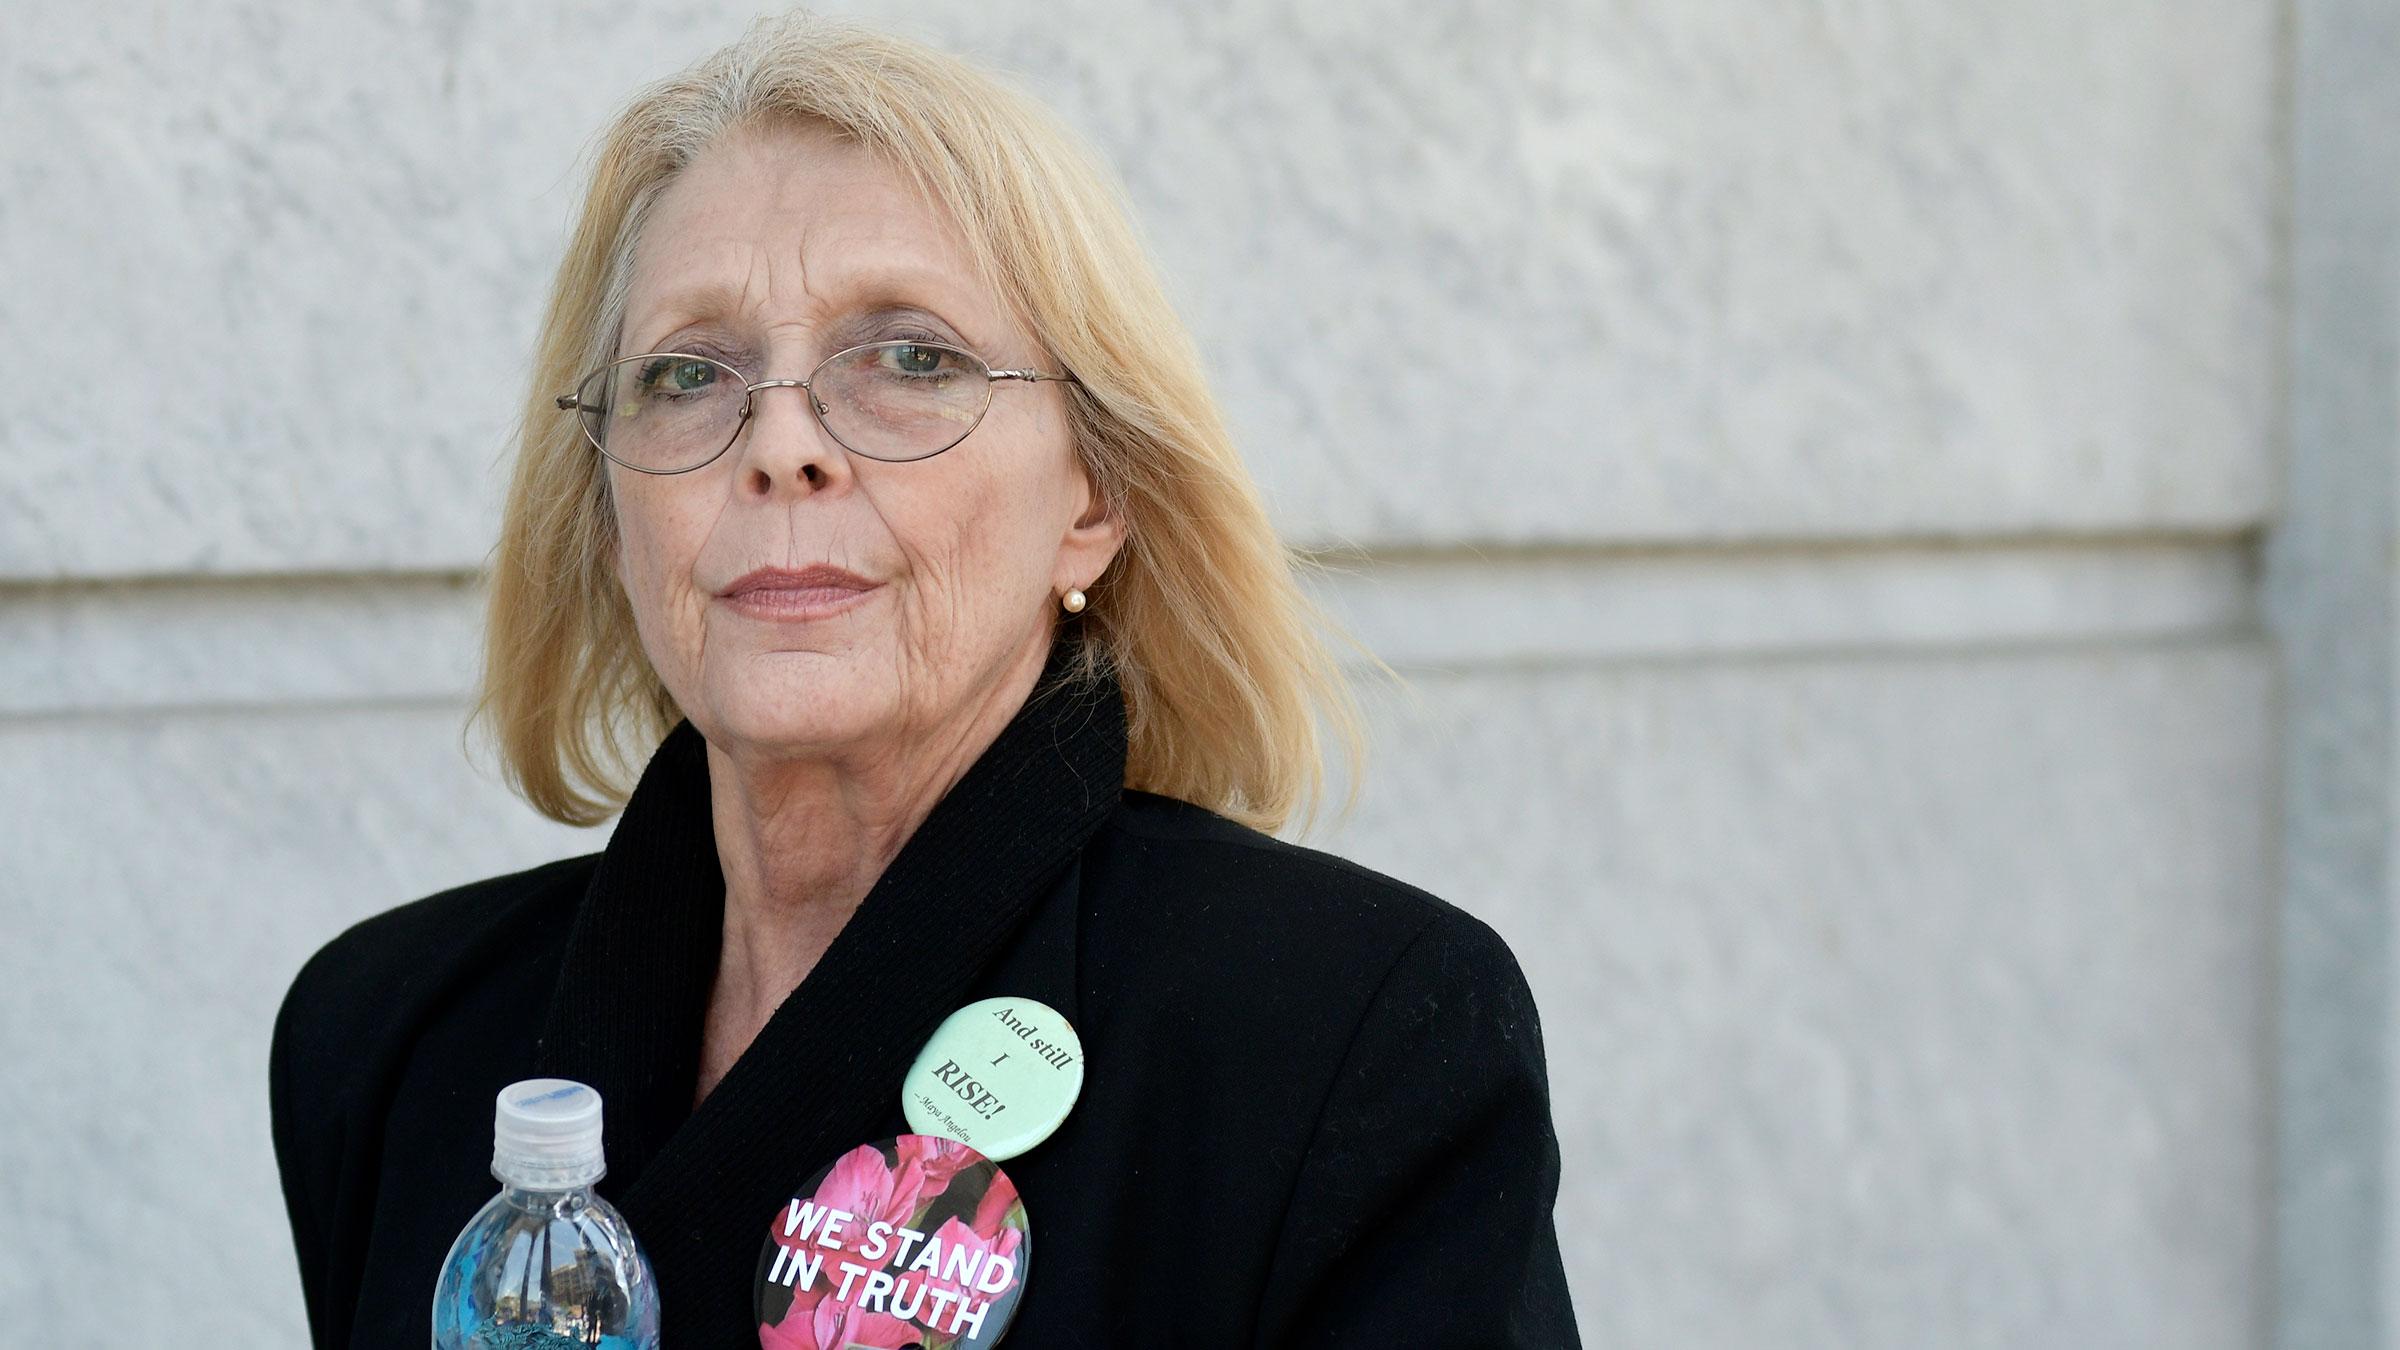 Victoria Valentino attends Bill Cosby's trial in Norristown, Pennsylvania, in 2017.